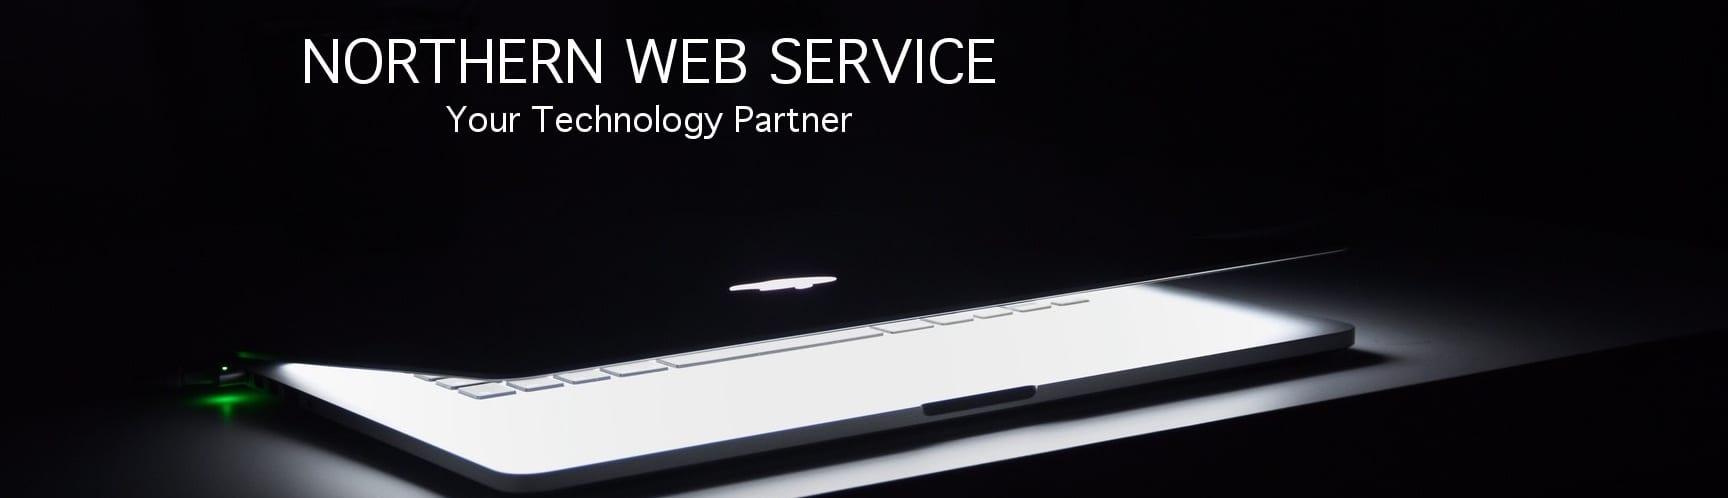 Northern Web Service